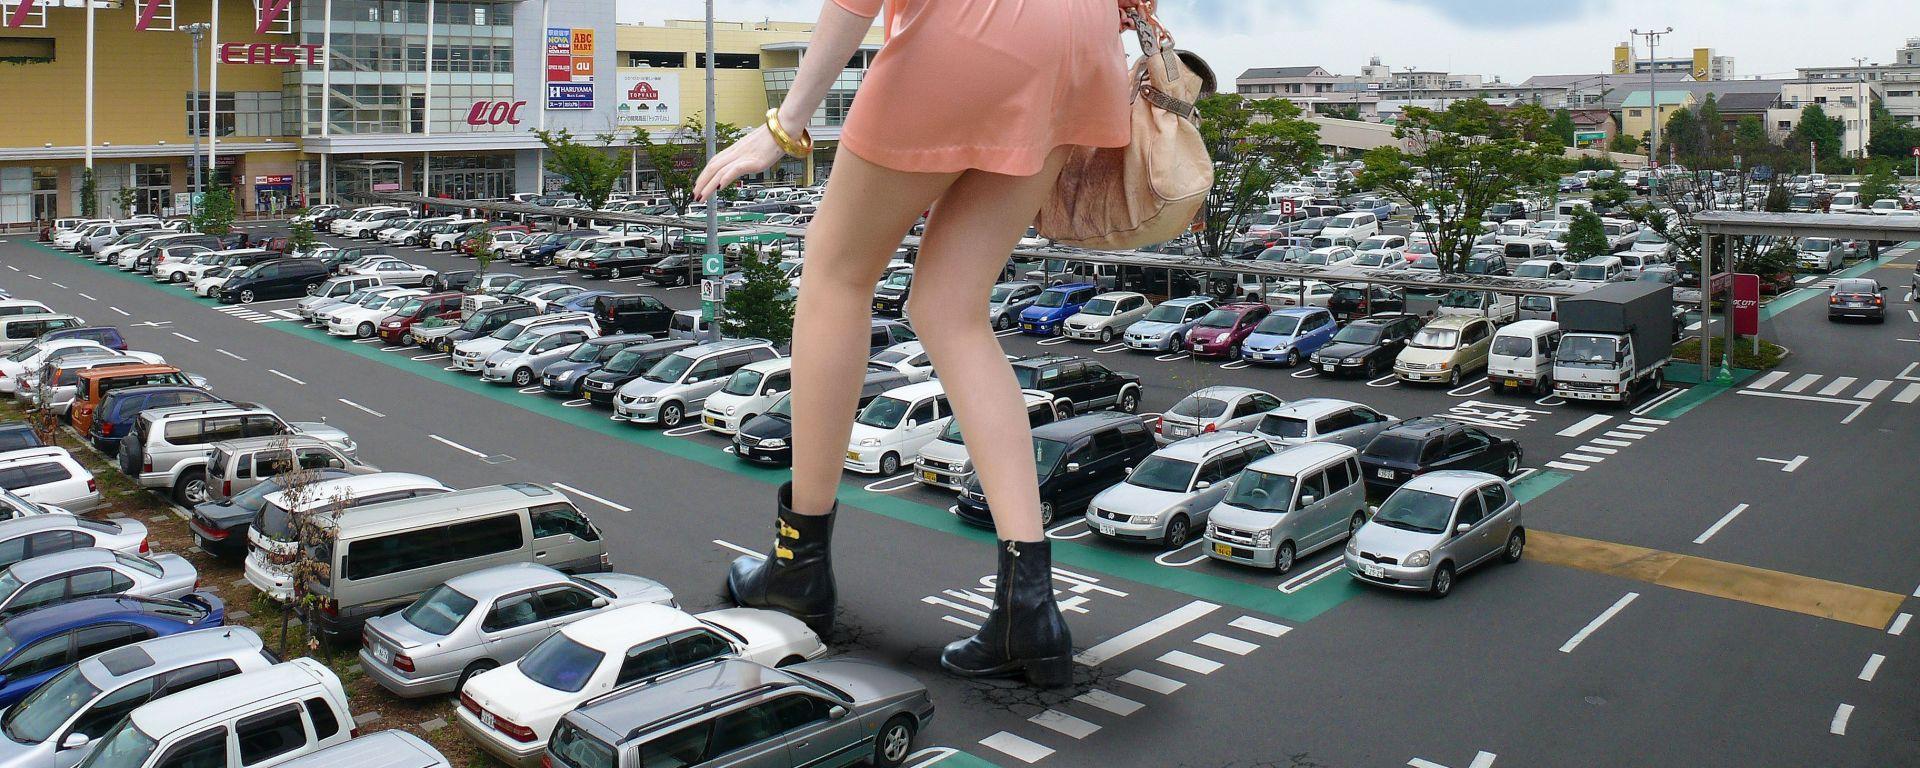 TomTom On-Street Parking: parcheggiare ora è semplice